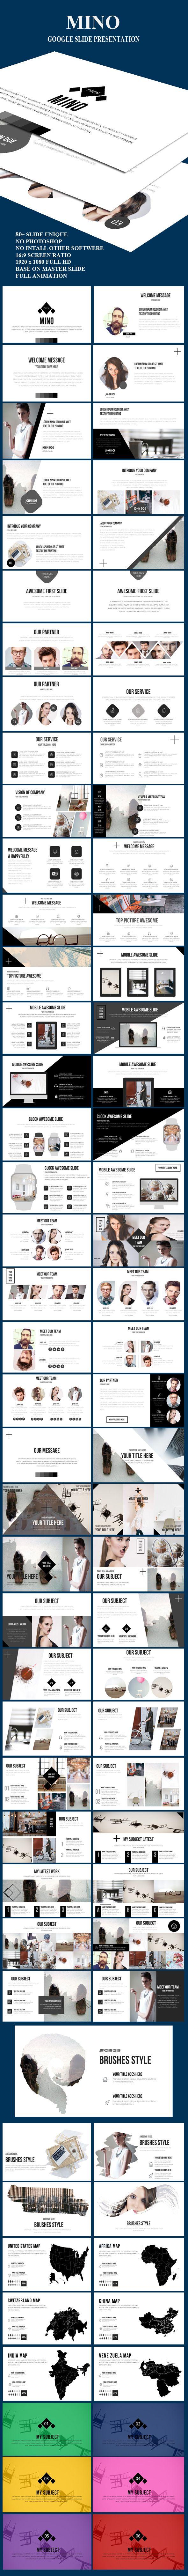 Mino Google Slide Presentation | Powerpoint presentation templates ...